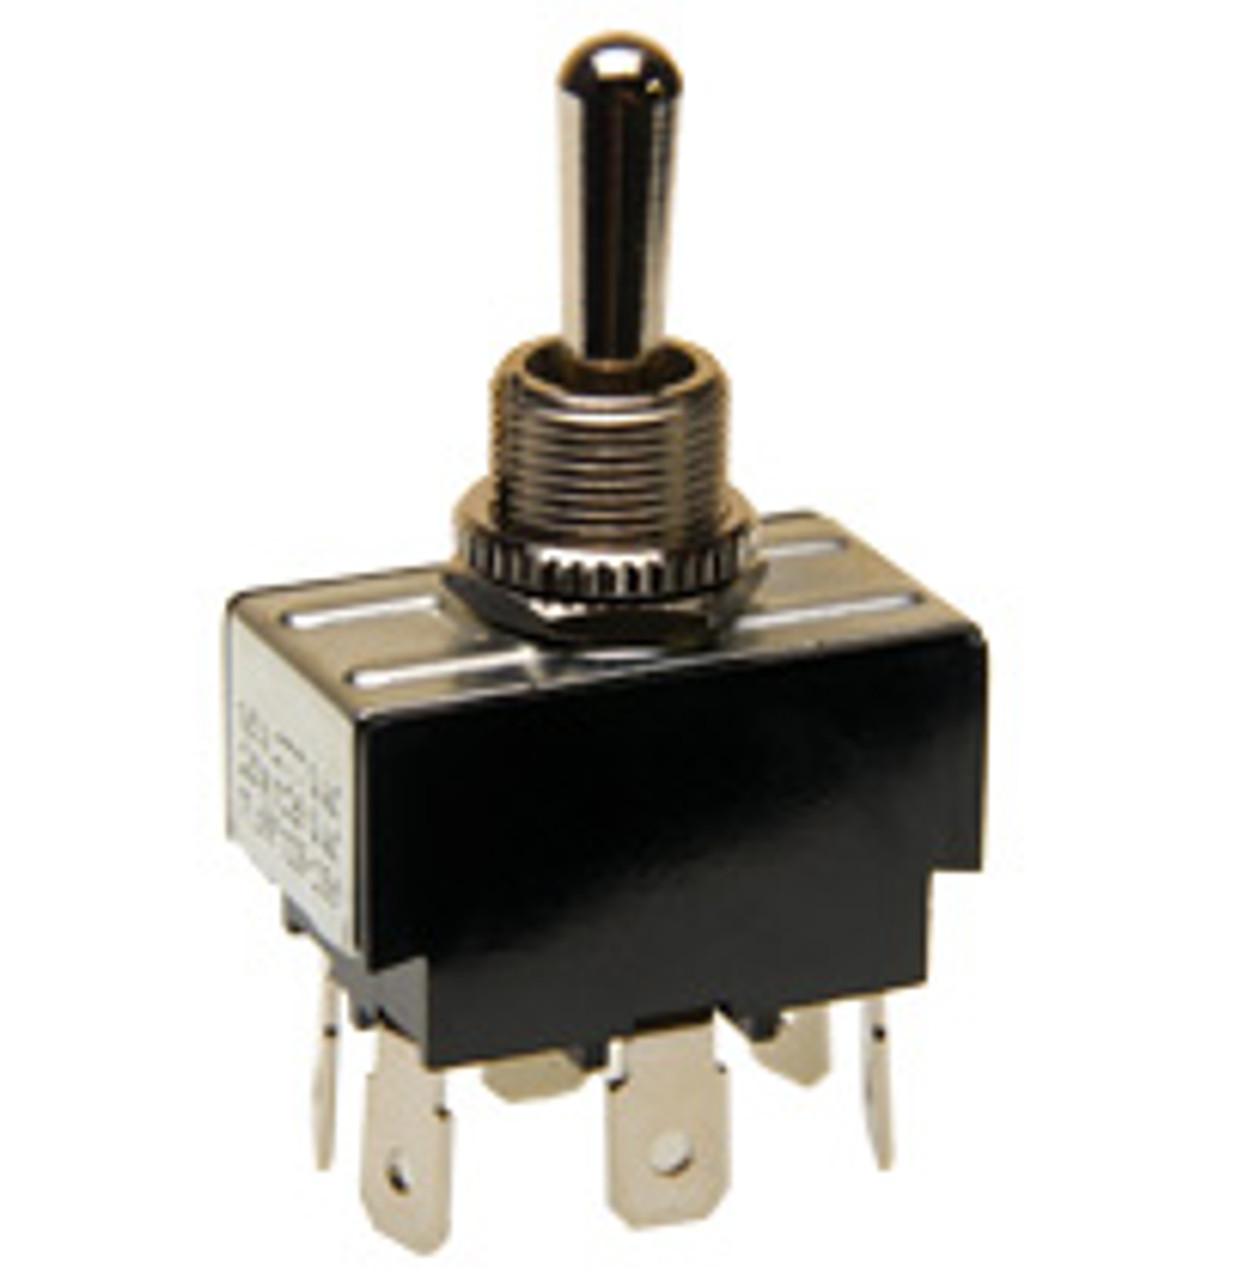 3 position switch 277 wiring diagram [ 1256 x 1280 Pixel ]